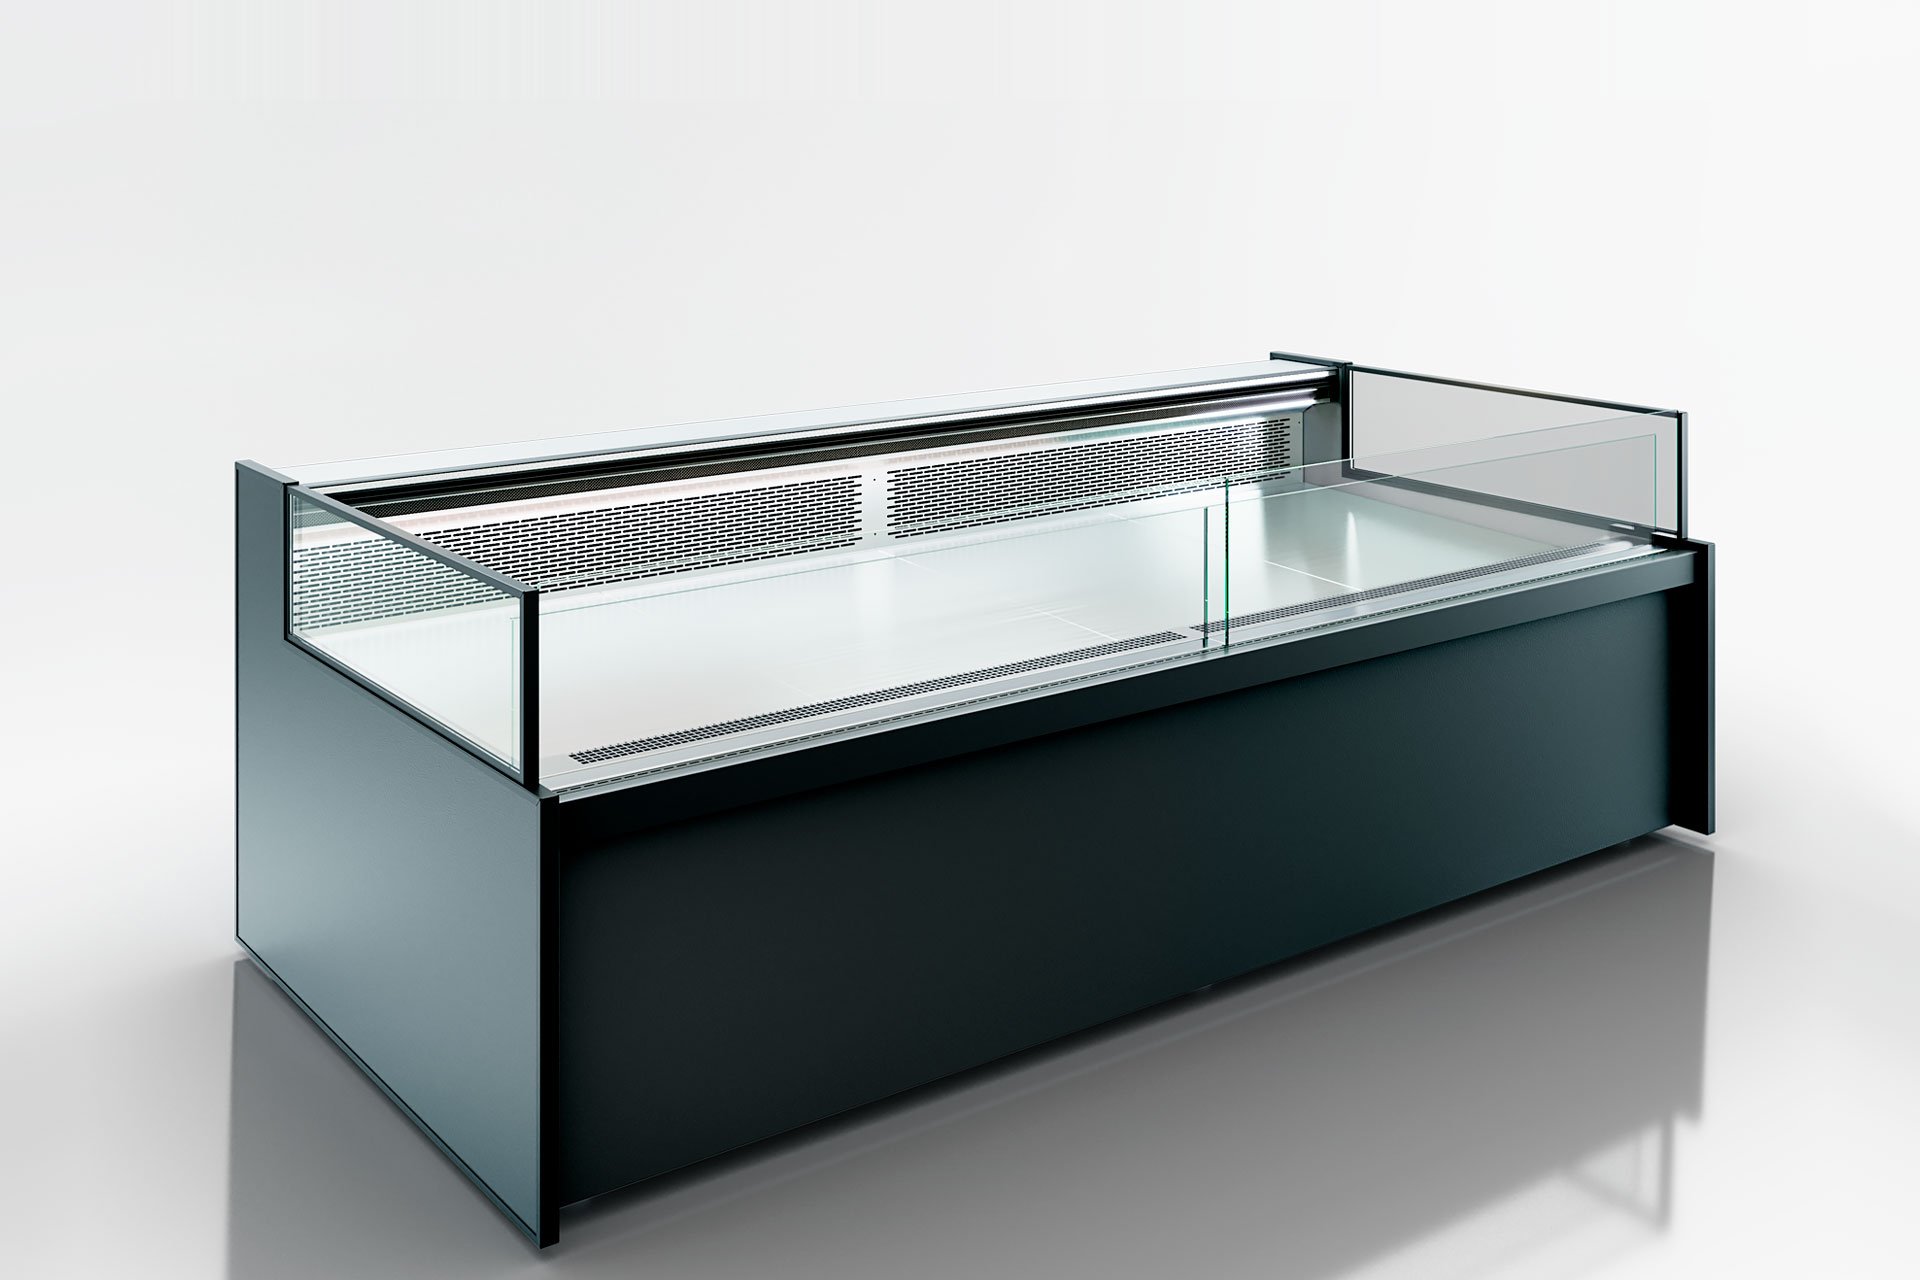 Refrigerated counters Missouri MC 120 deli self 086-DBM/DLM